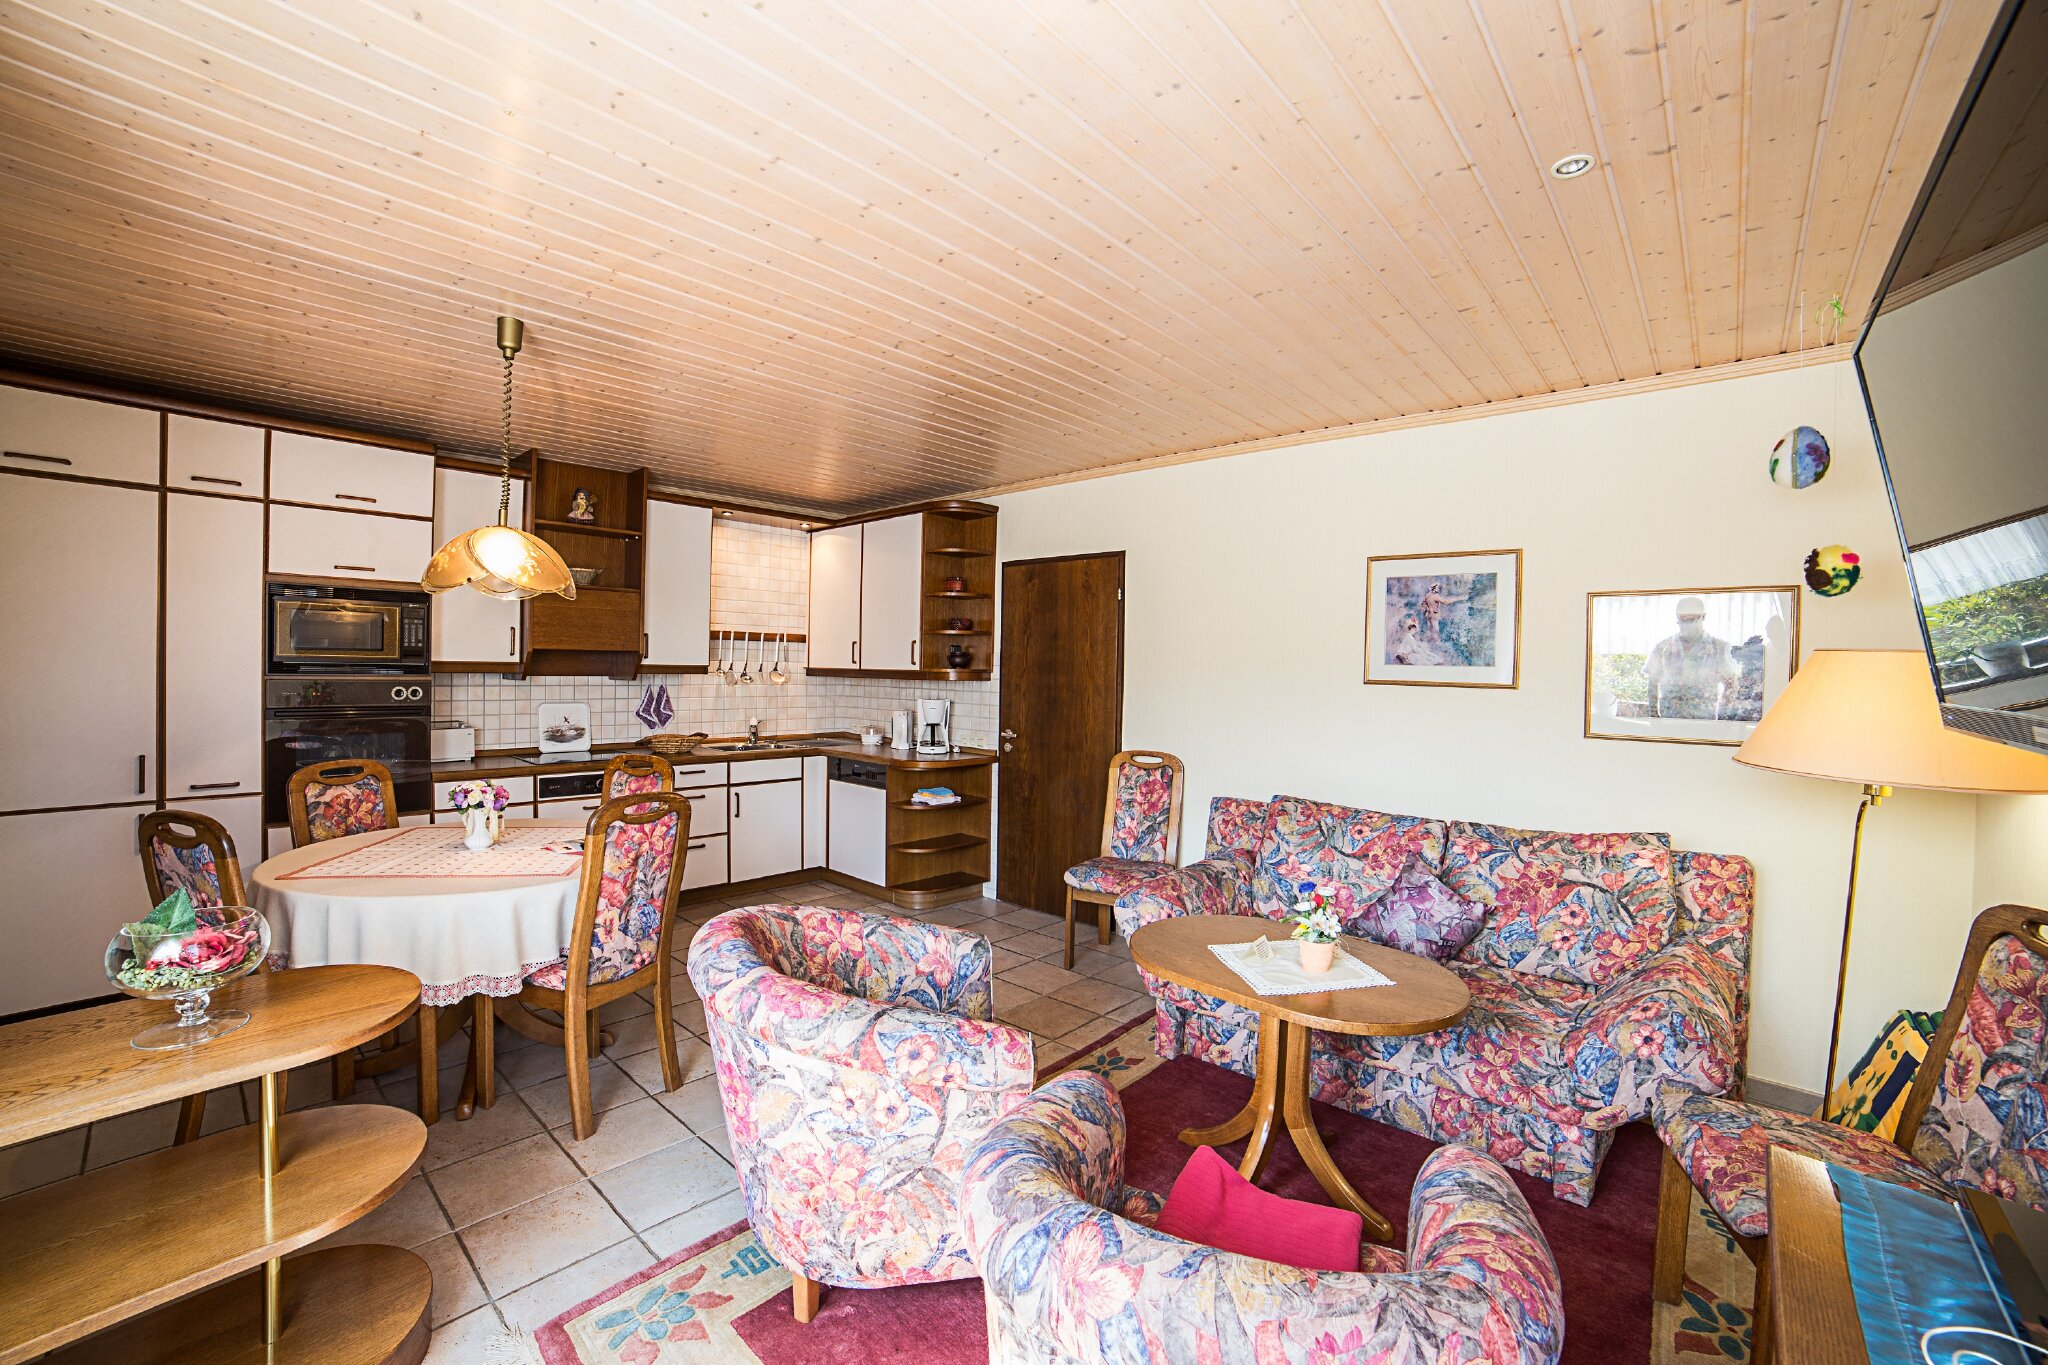 ferienwohnung panorama 2 hotel gasthof freihof in. Black Bedroom Furniture Sets. Home Design Ideas